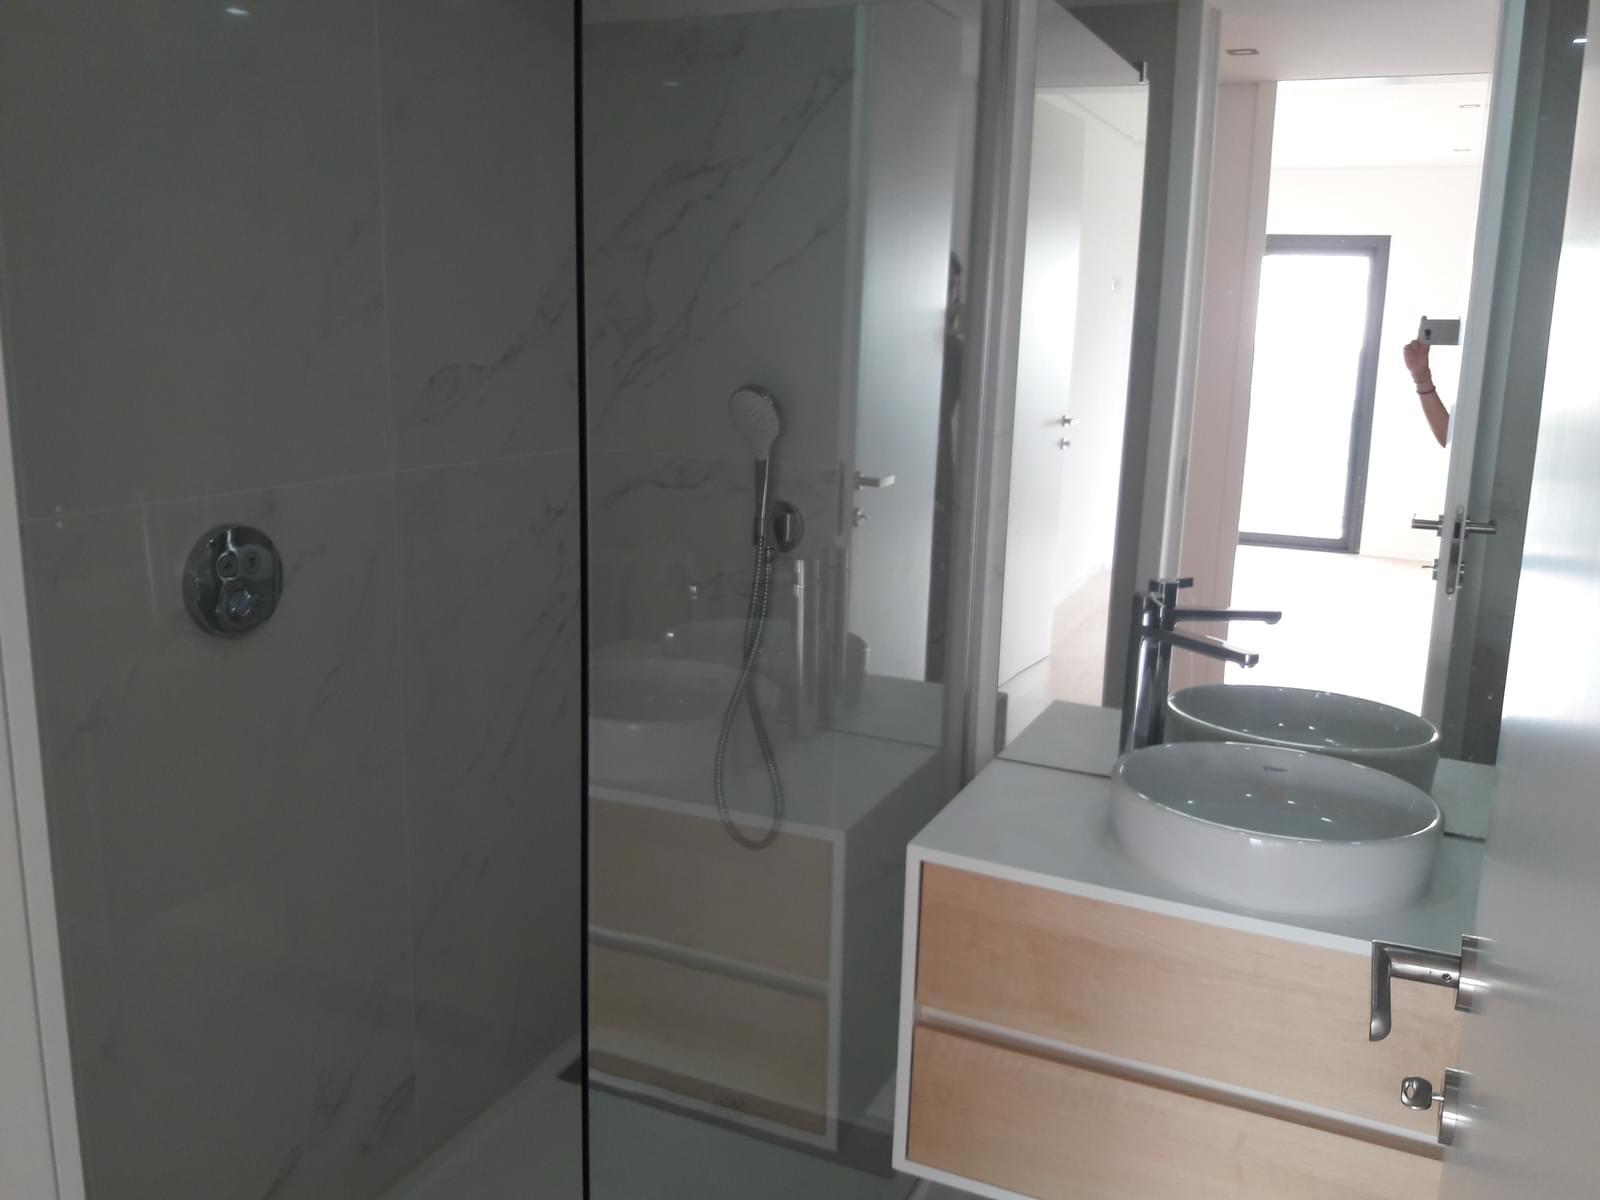 pf18284-apartamento-t2-cascais-2614306d-259f-4ae0-bf92-78495b375fc4